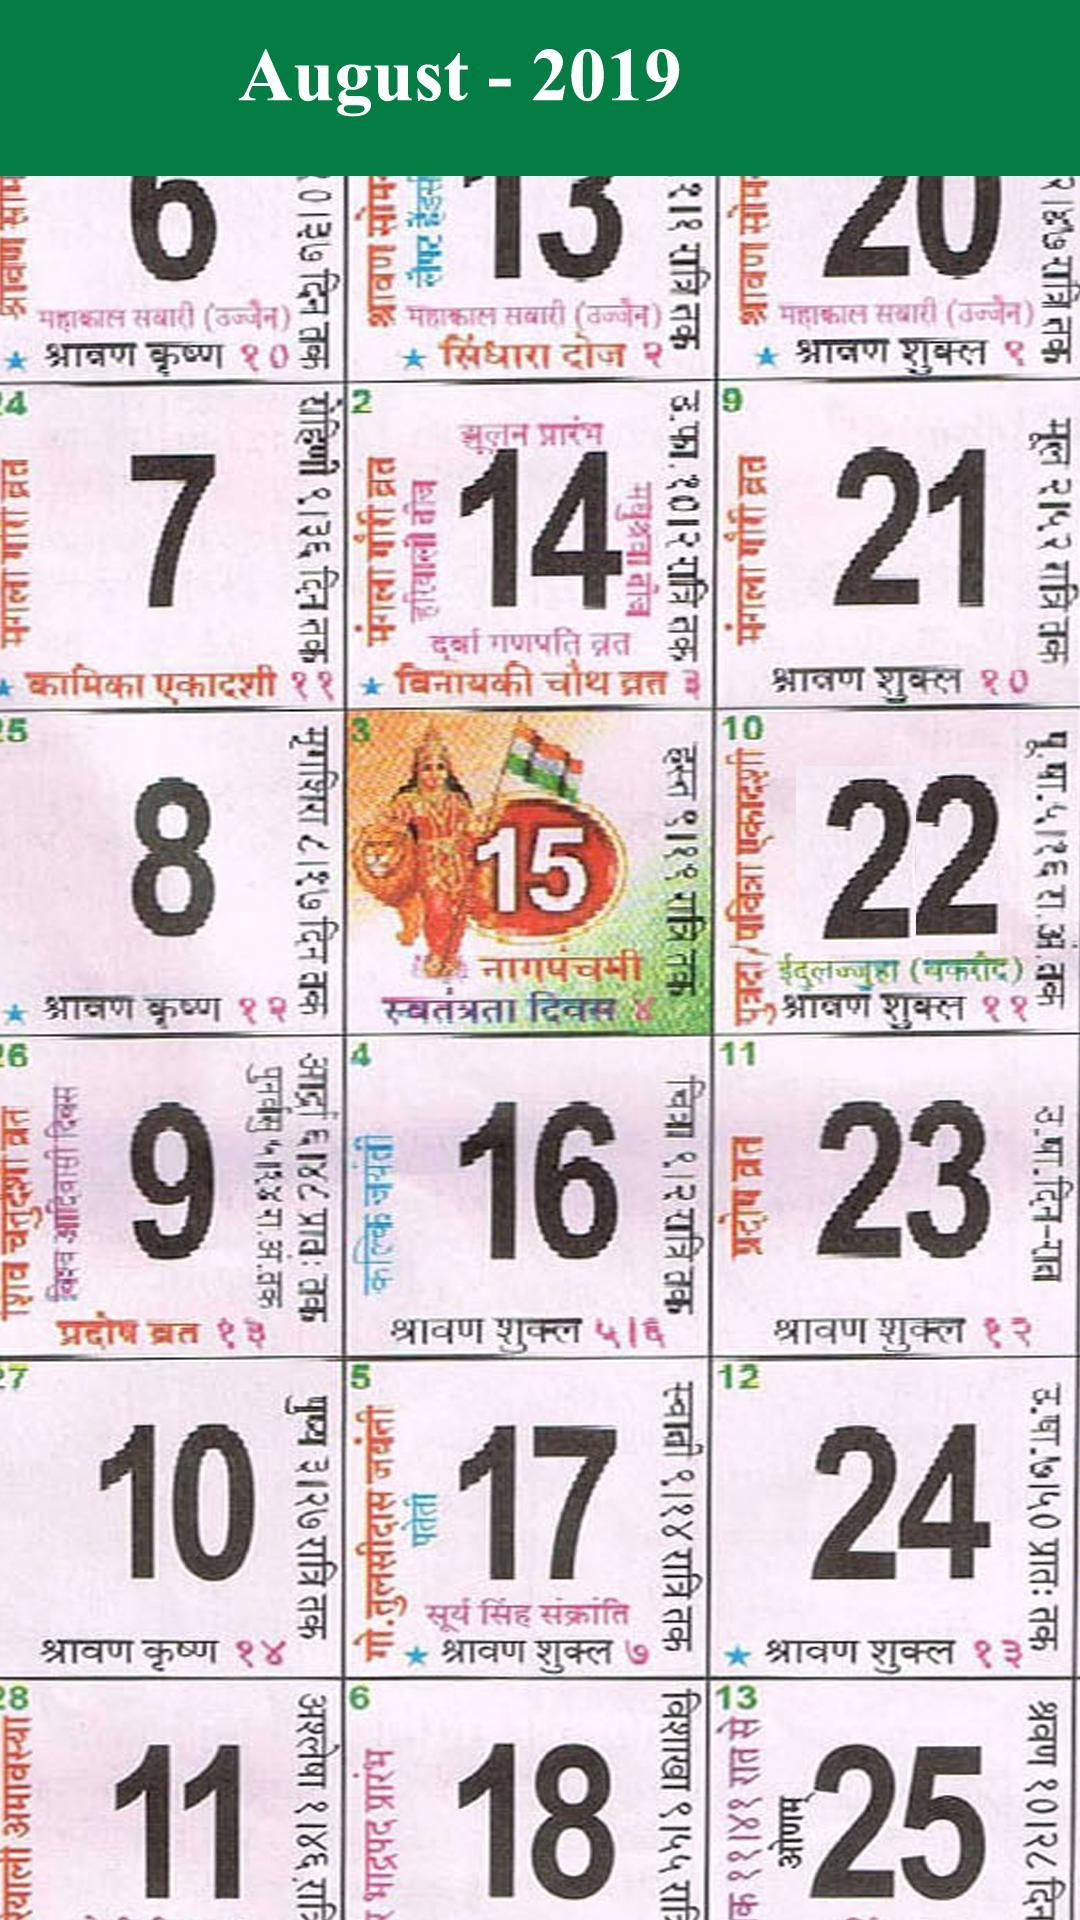 Hindi Calendar 2019 For Android  Apk Download inside Khalsa Heera Jantri 2020 Pdf Download